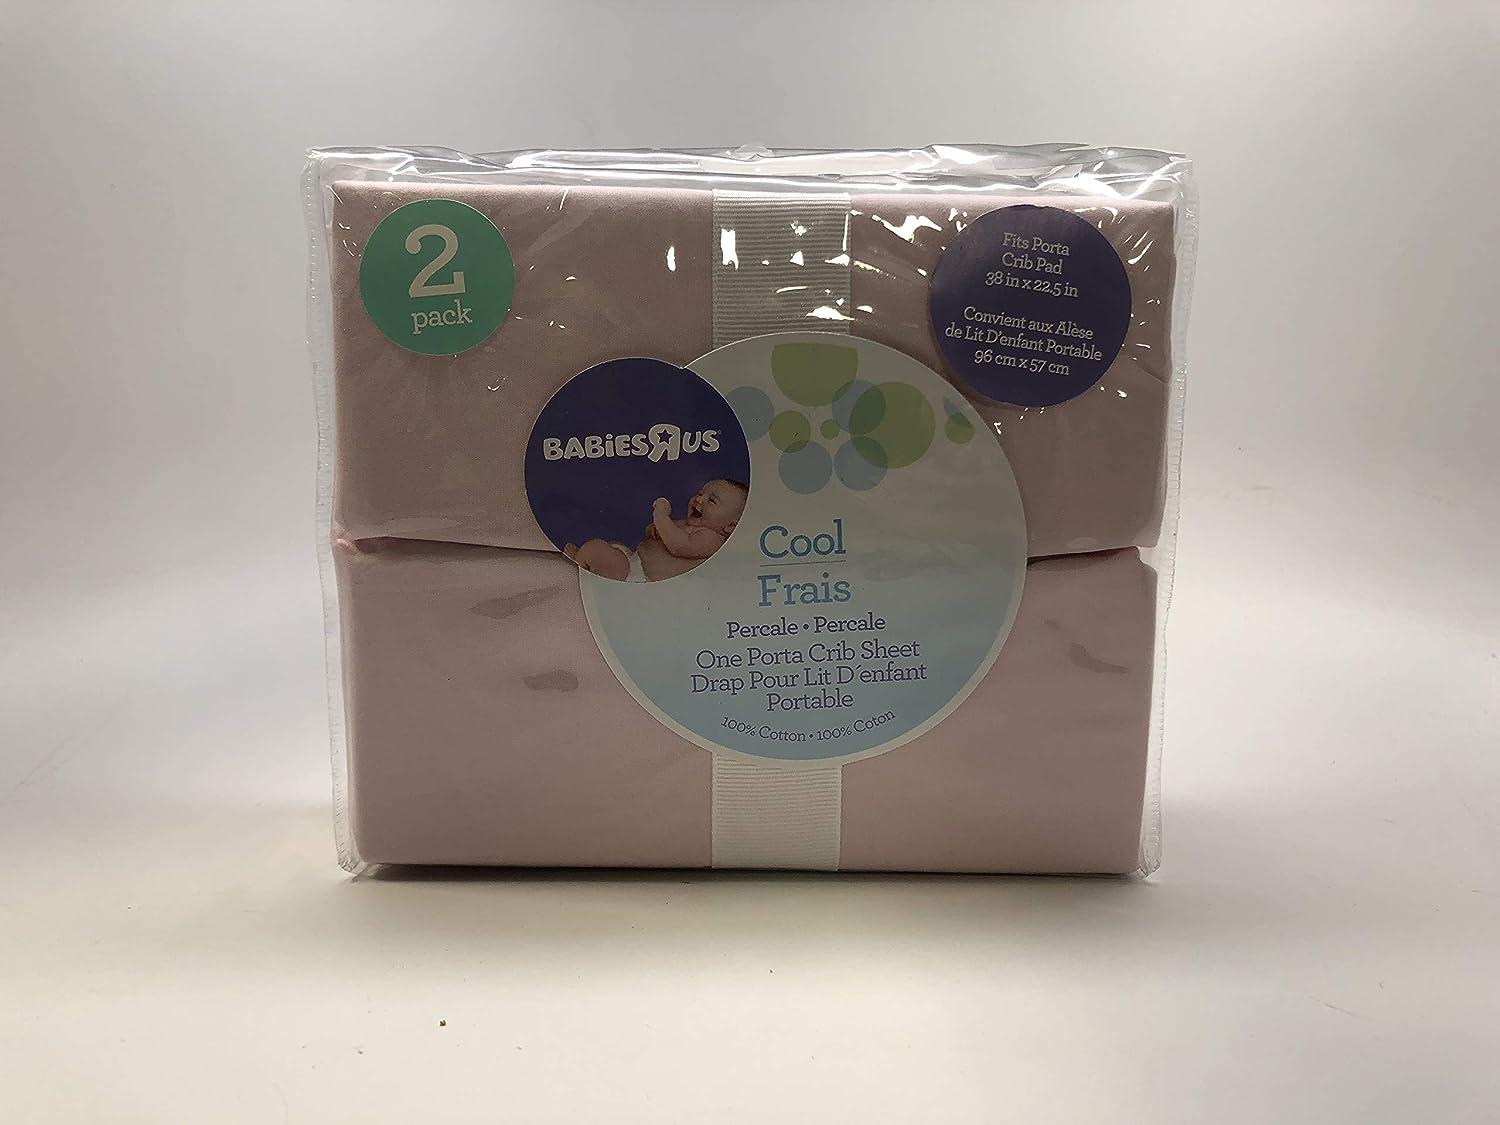 Babies'R'Us - Portable Crib Sheet(2 Pack) - Cool Pink